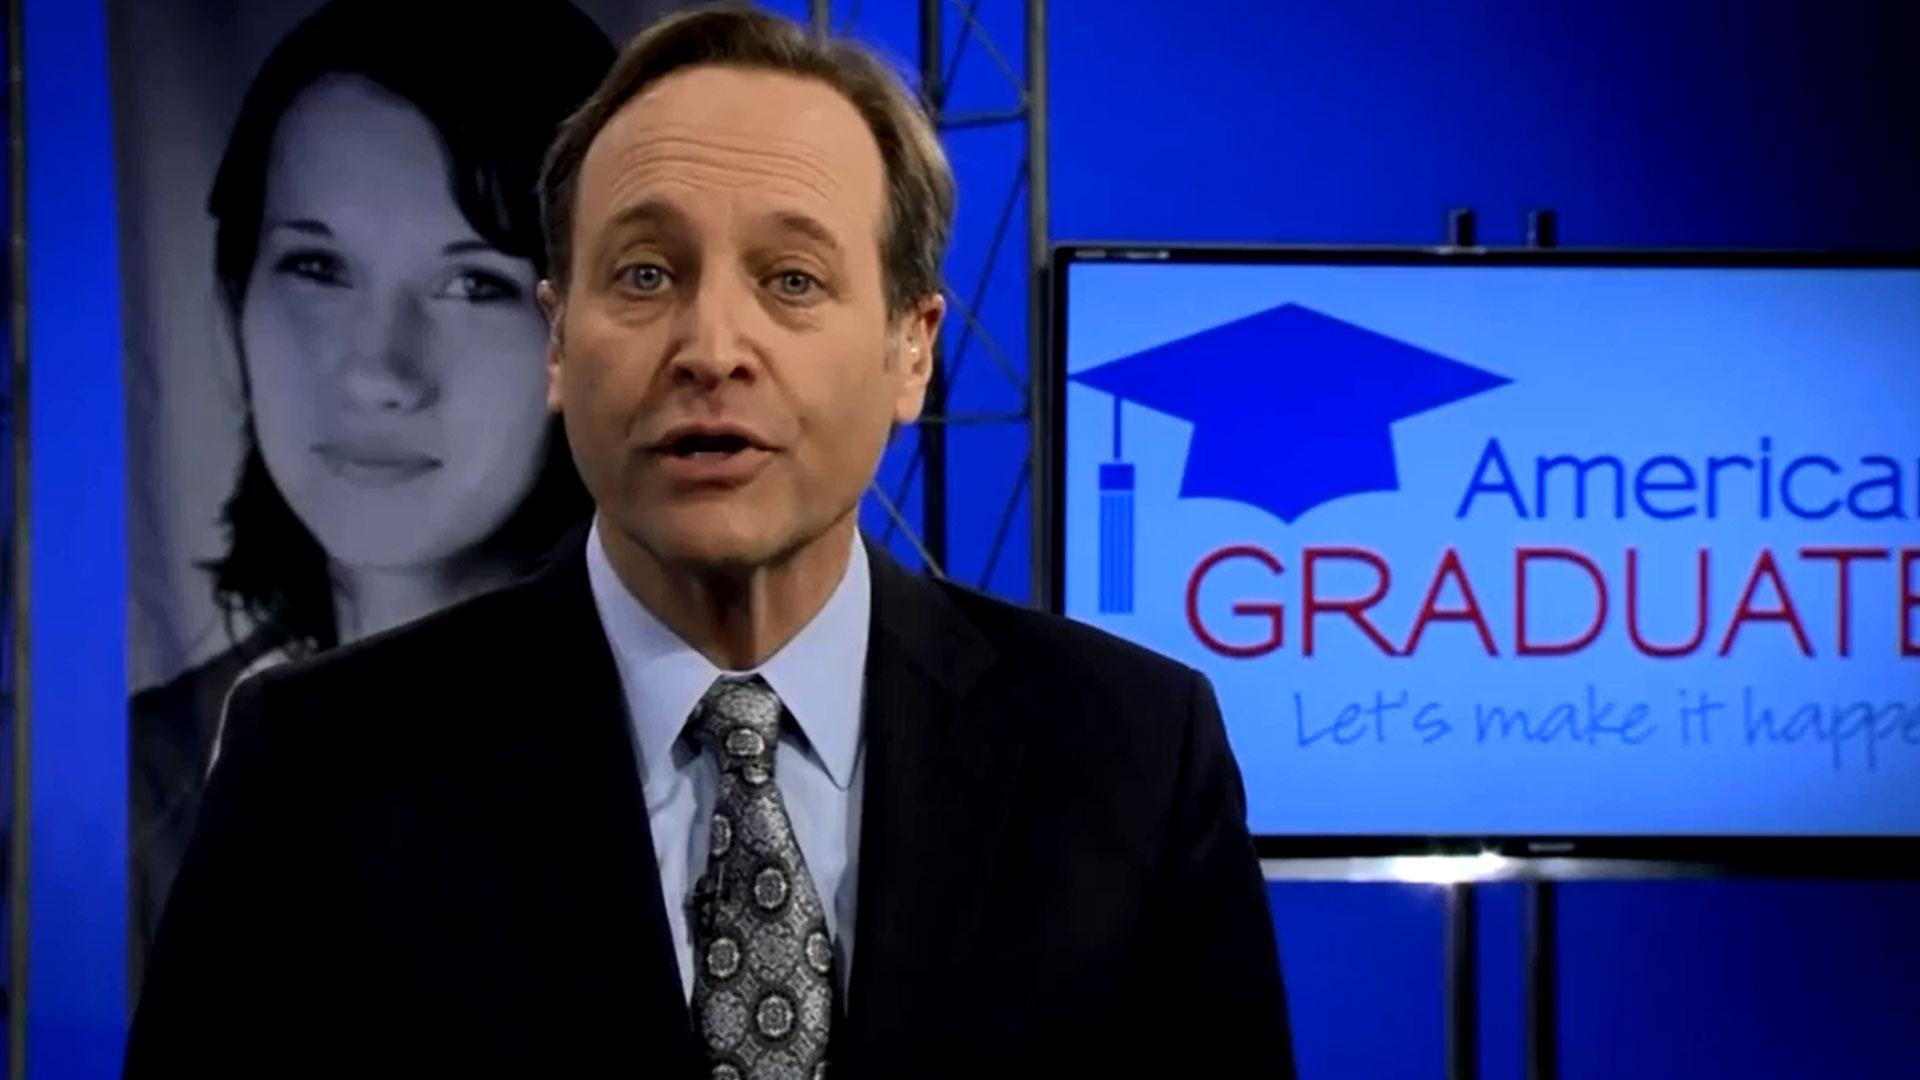 American Graduate Highlights 2012-14